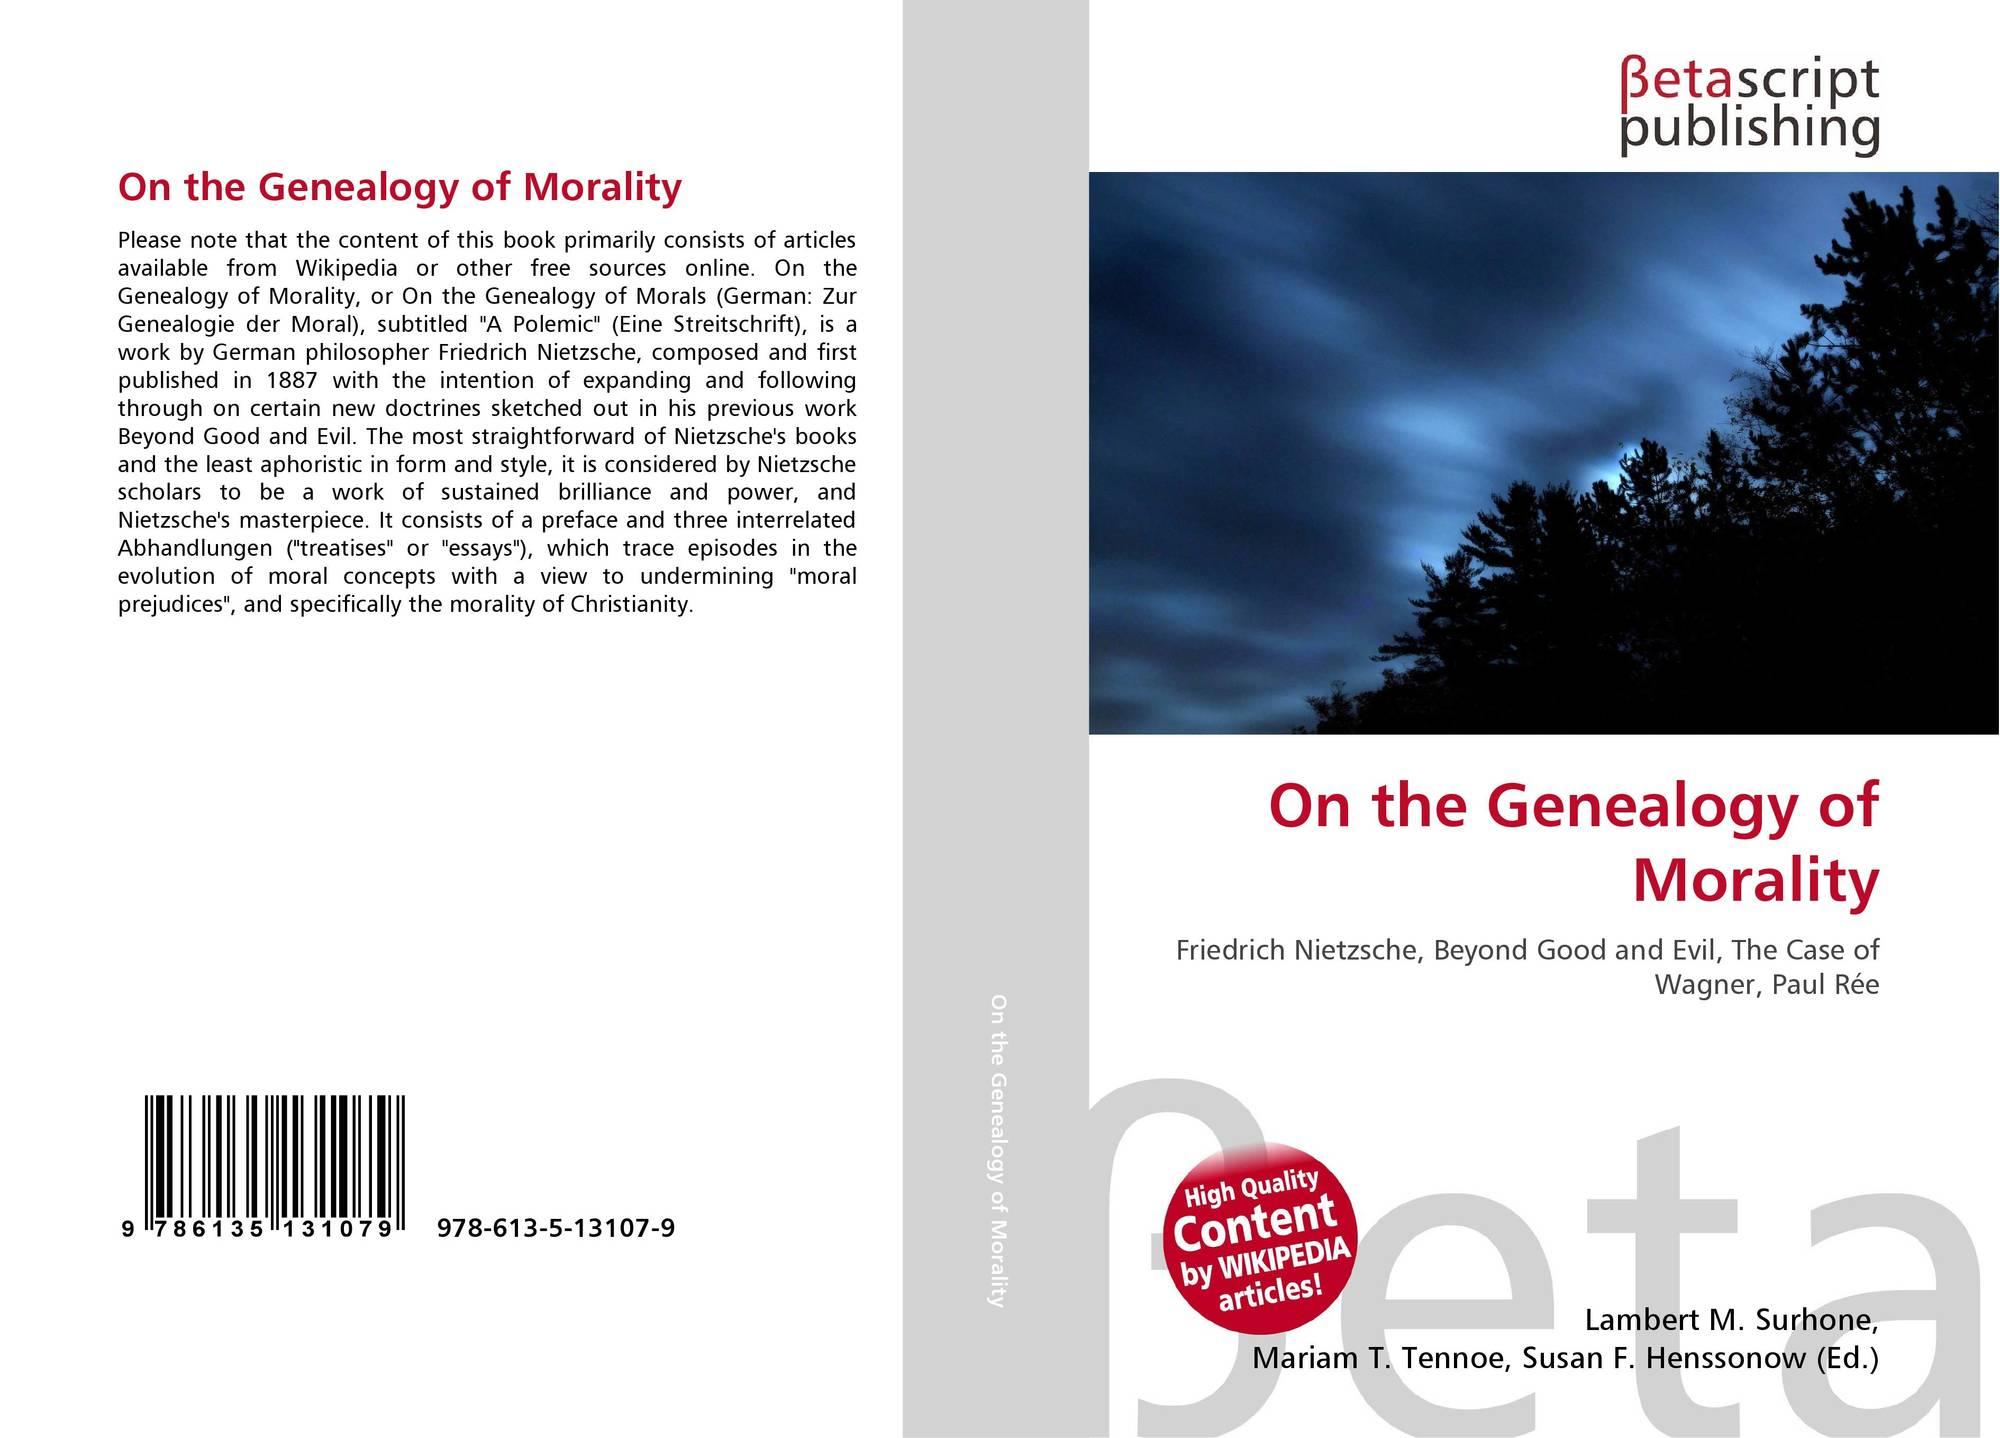 nietzsche first essay genealogy of morals summary